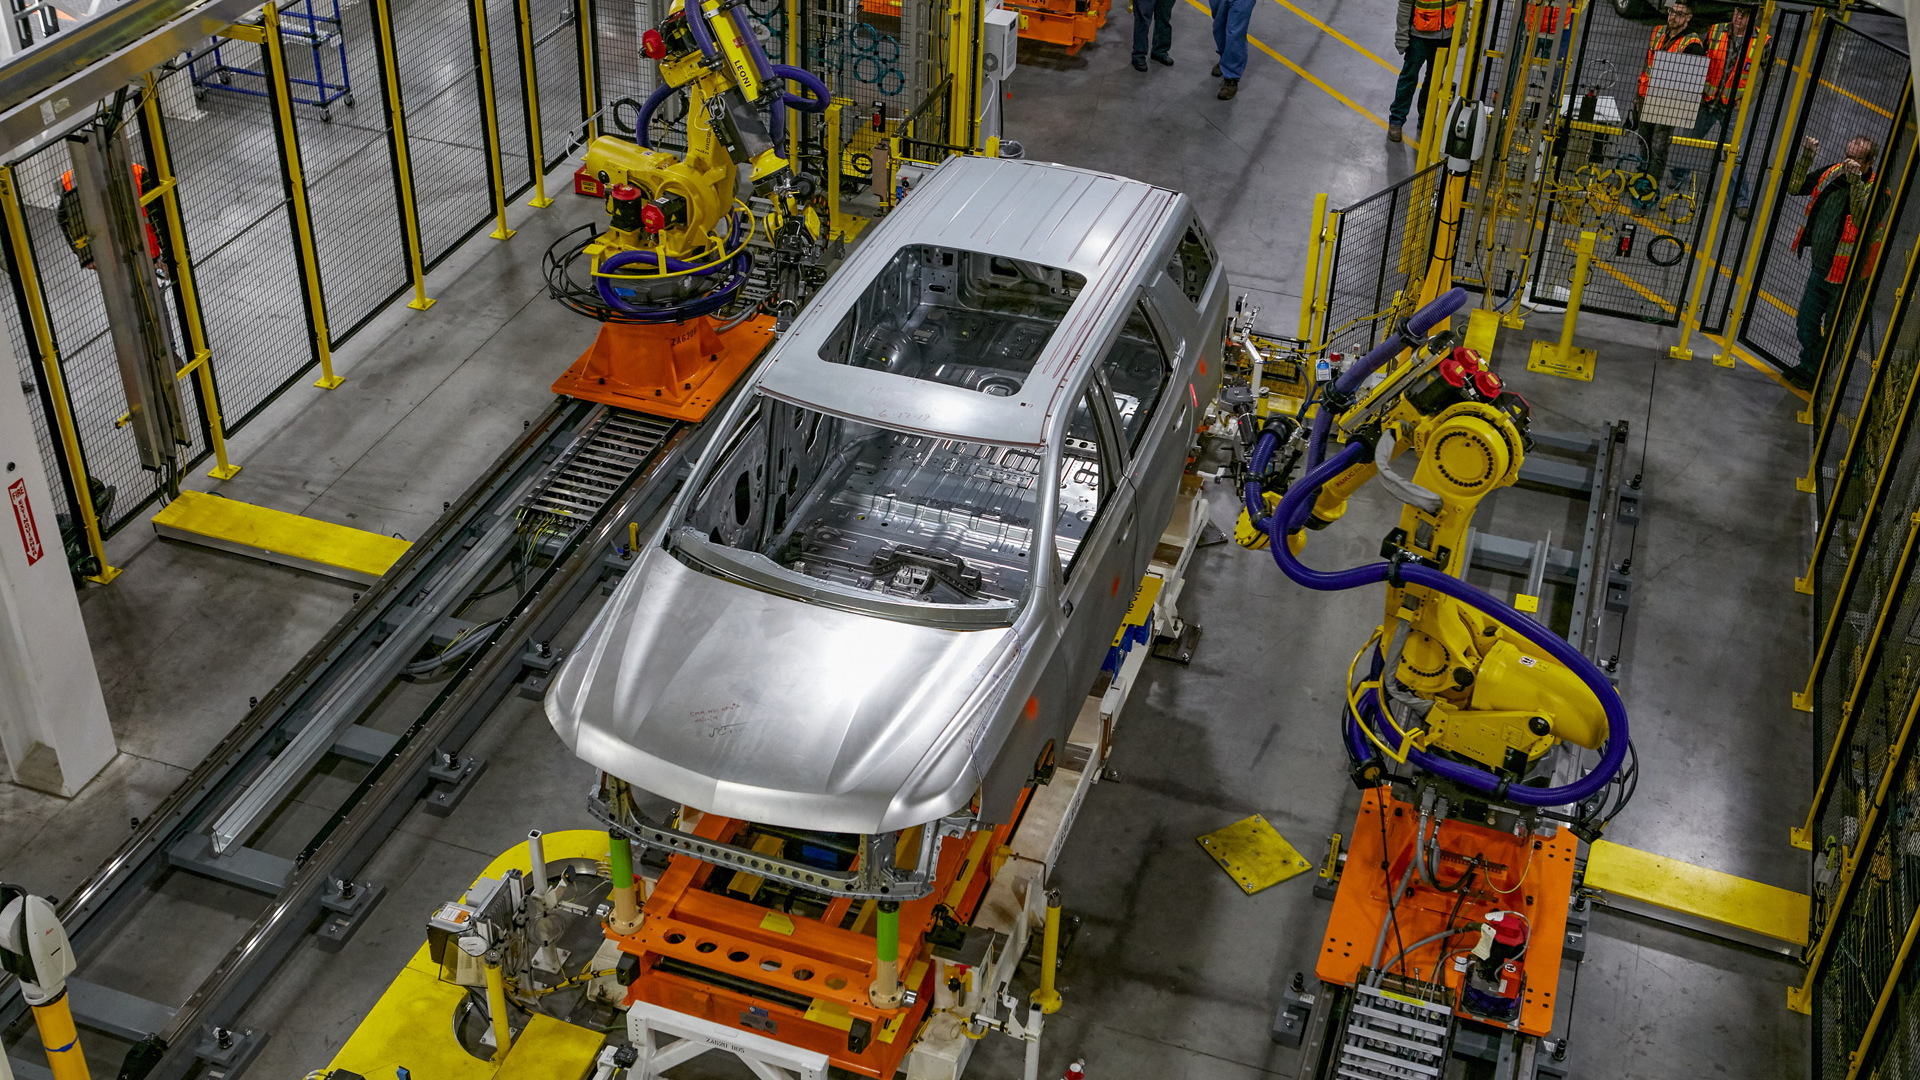 Production at General Motors' Arlington Assembly plant in Arlington, Texas